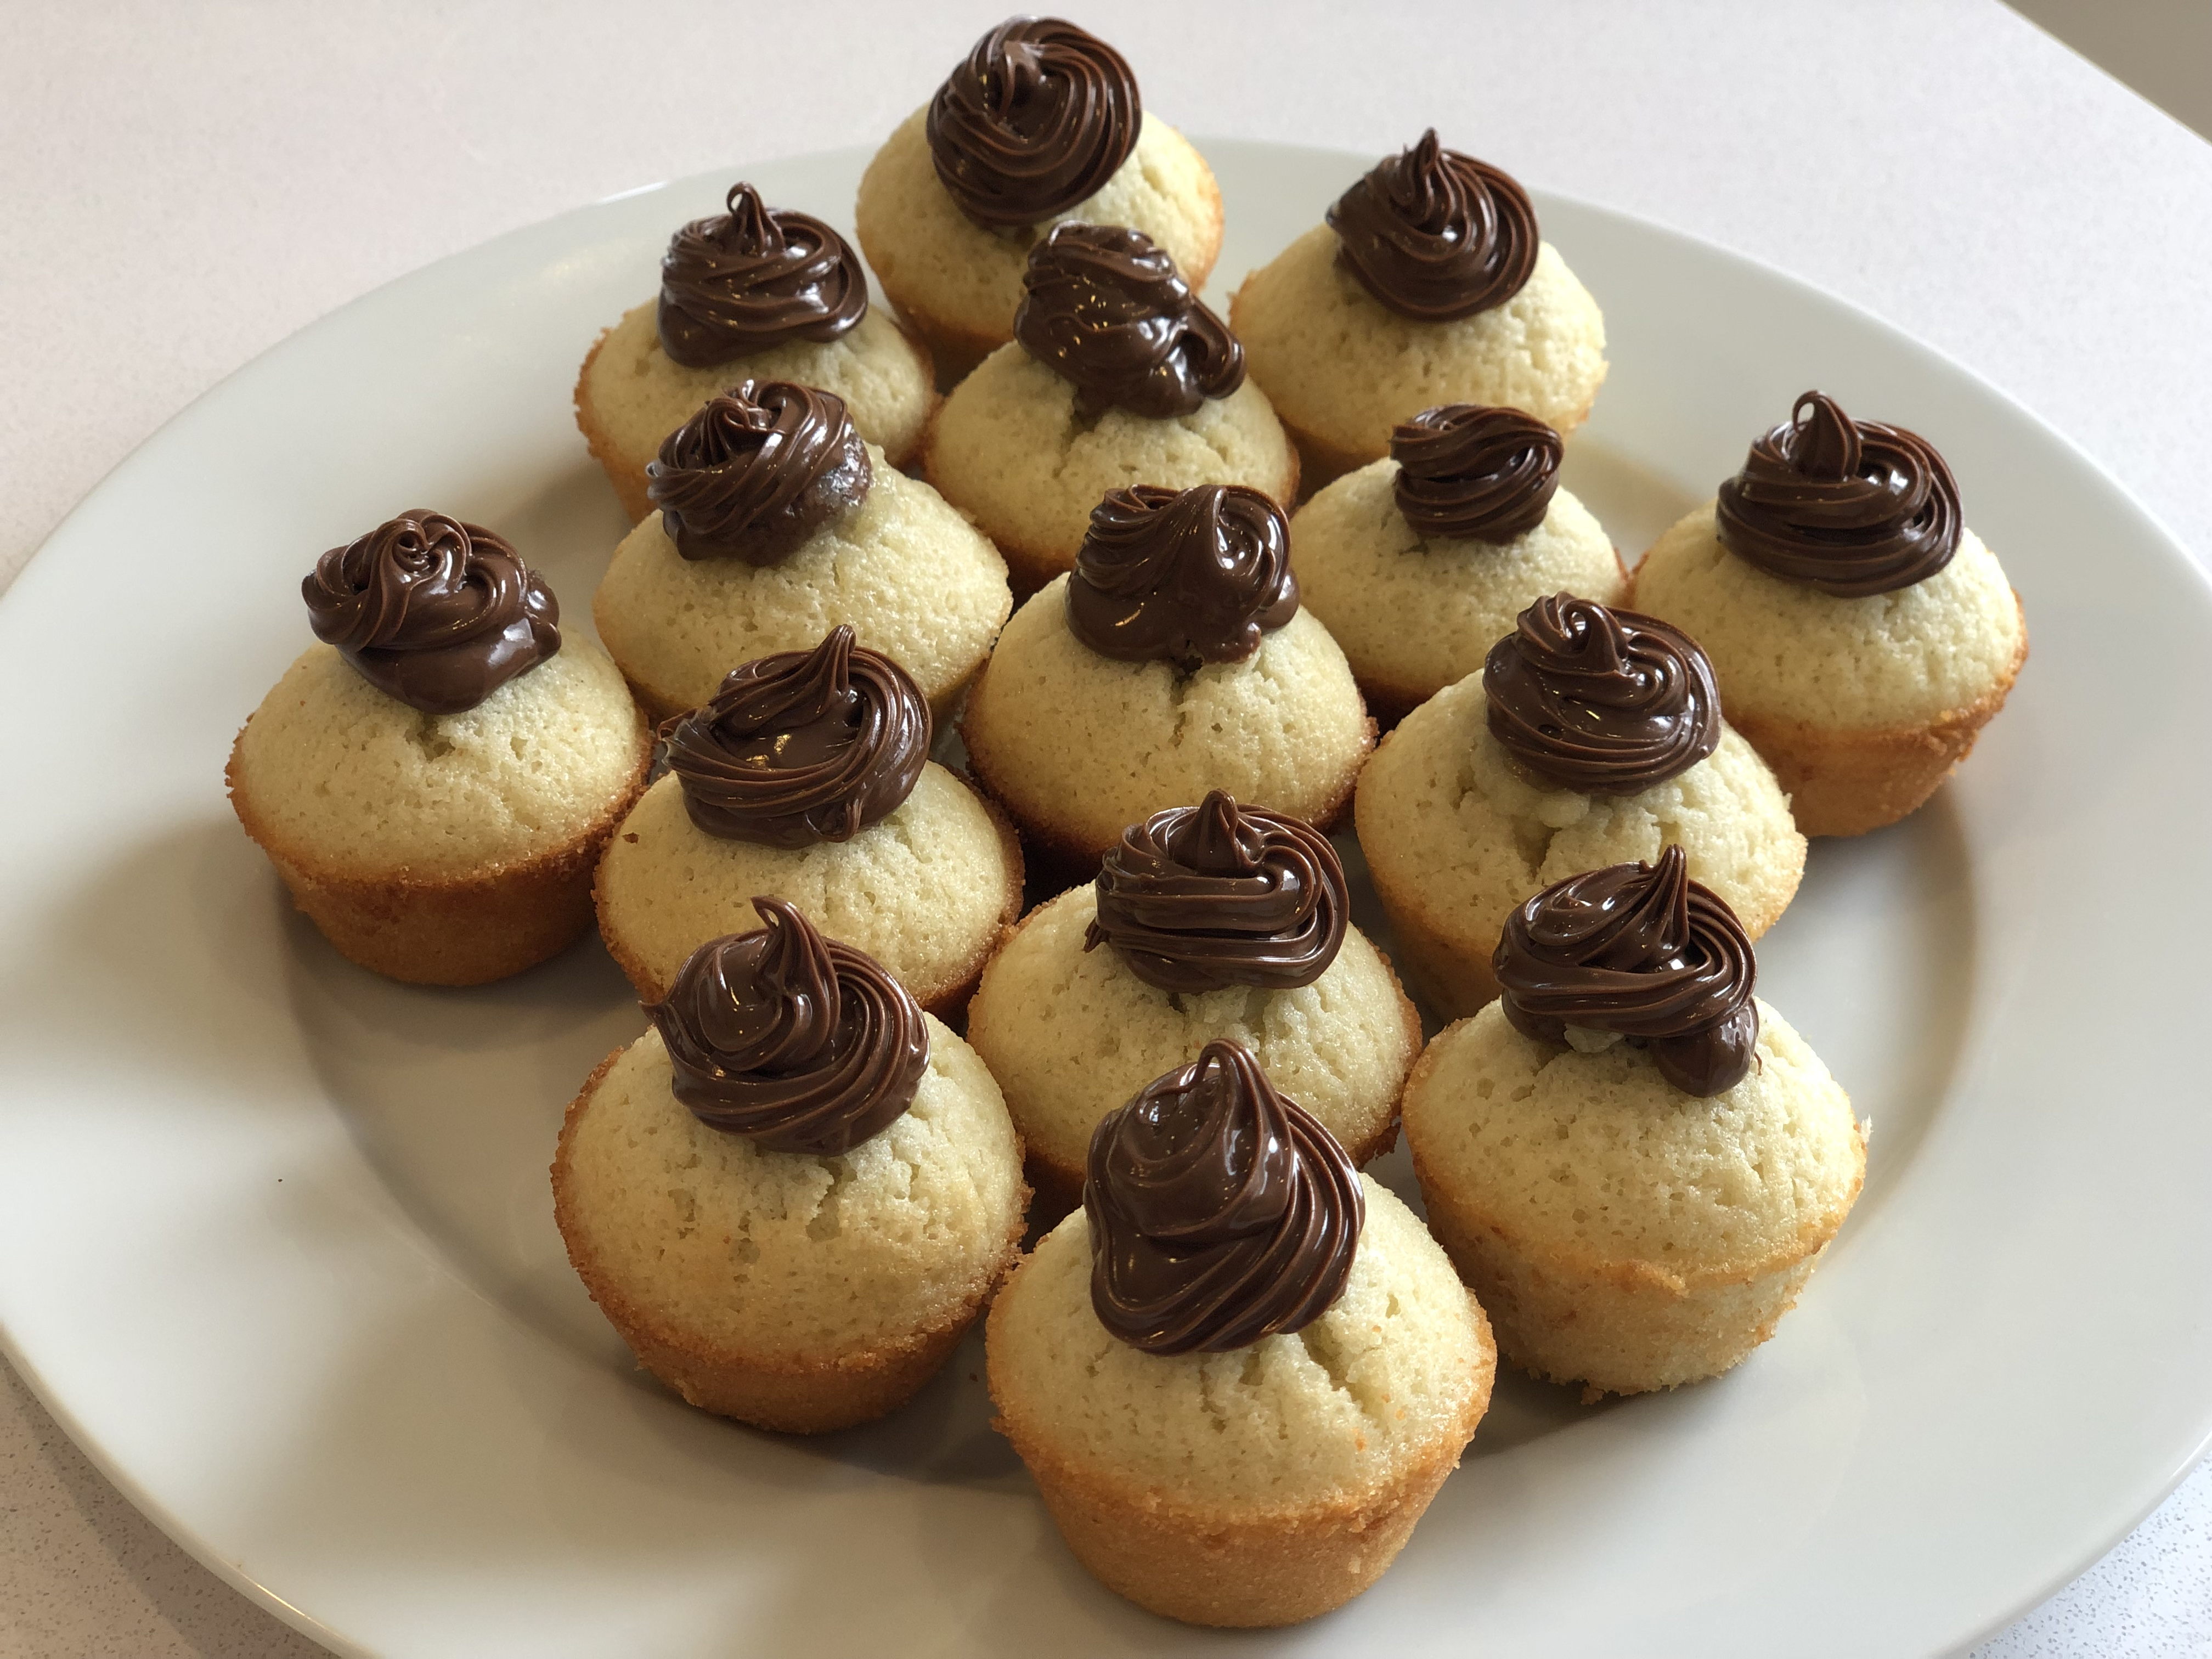 Almond Sponge Cakes with Nutella® hazelnut spread DieBee